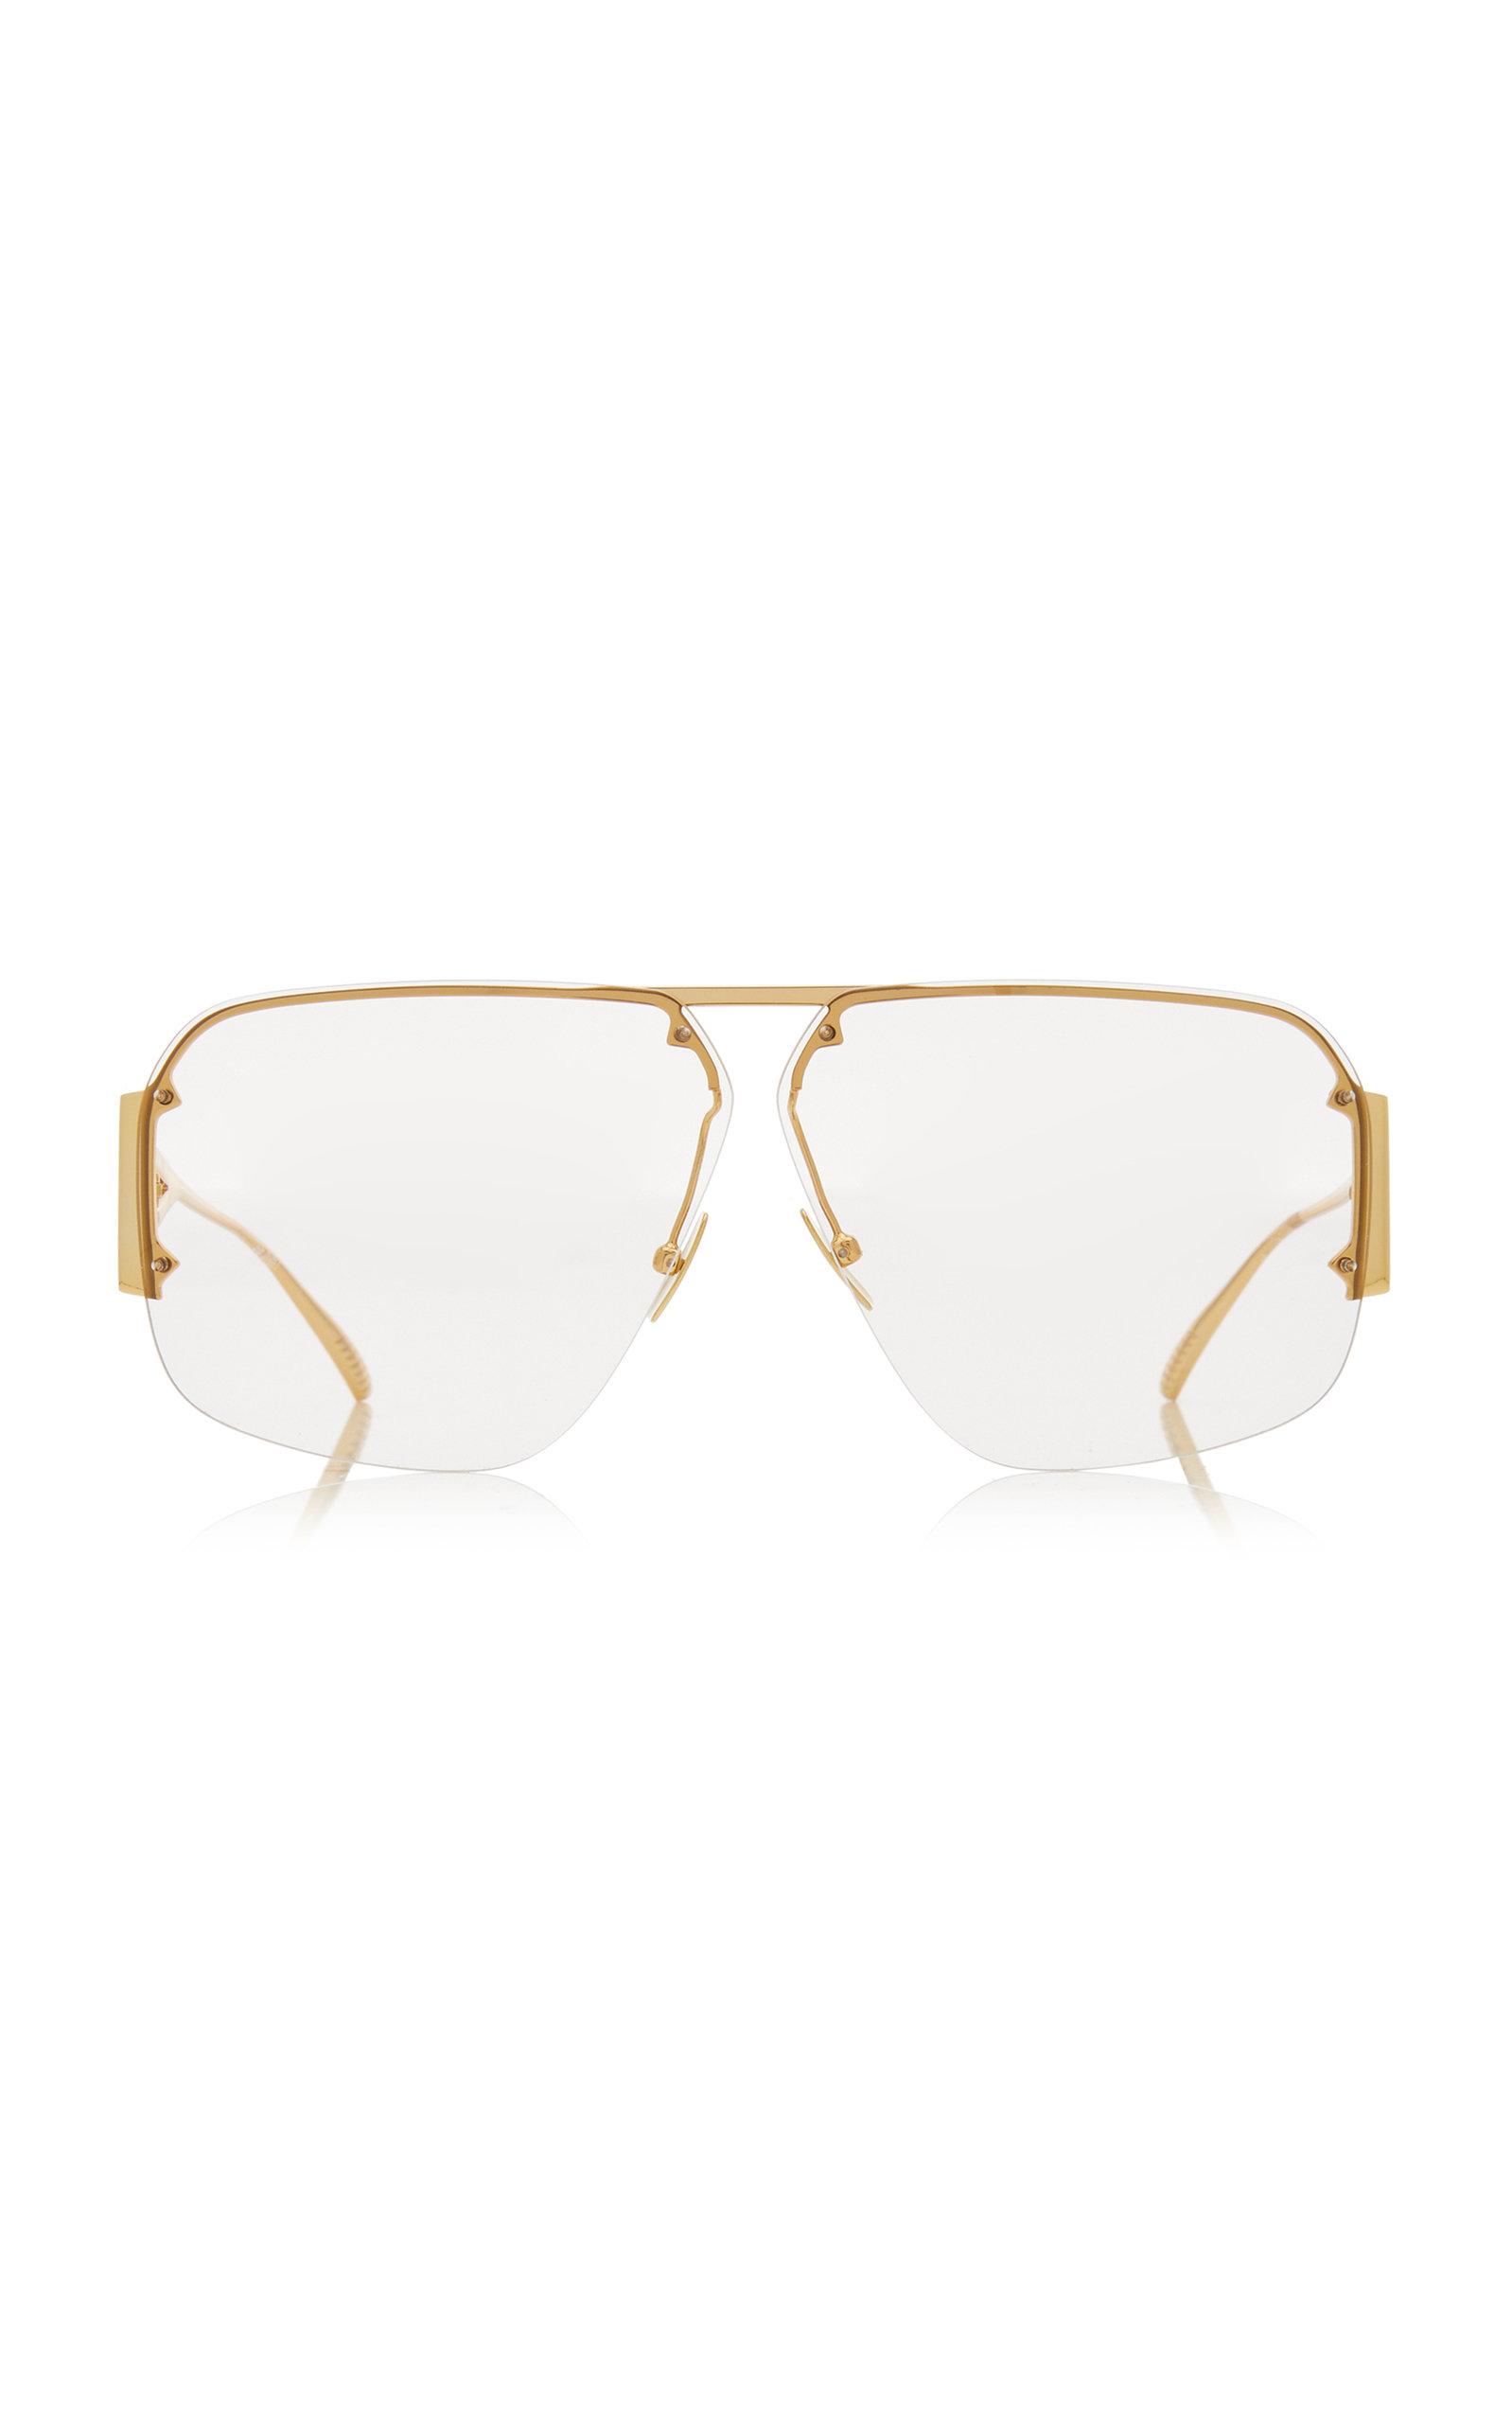 Bottega Veneta - Women's Pilot-Frame Metal Sunglasses - Gold - Moda Operandi